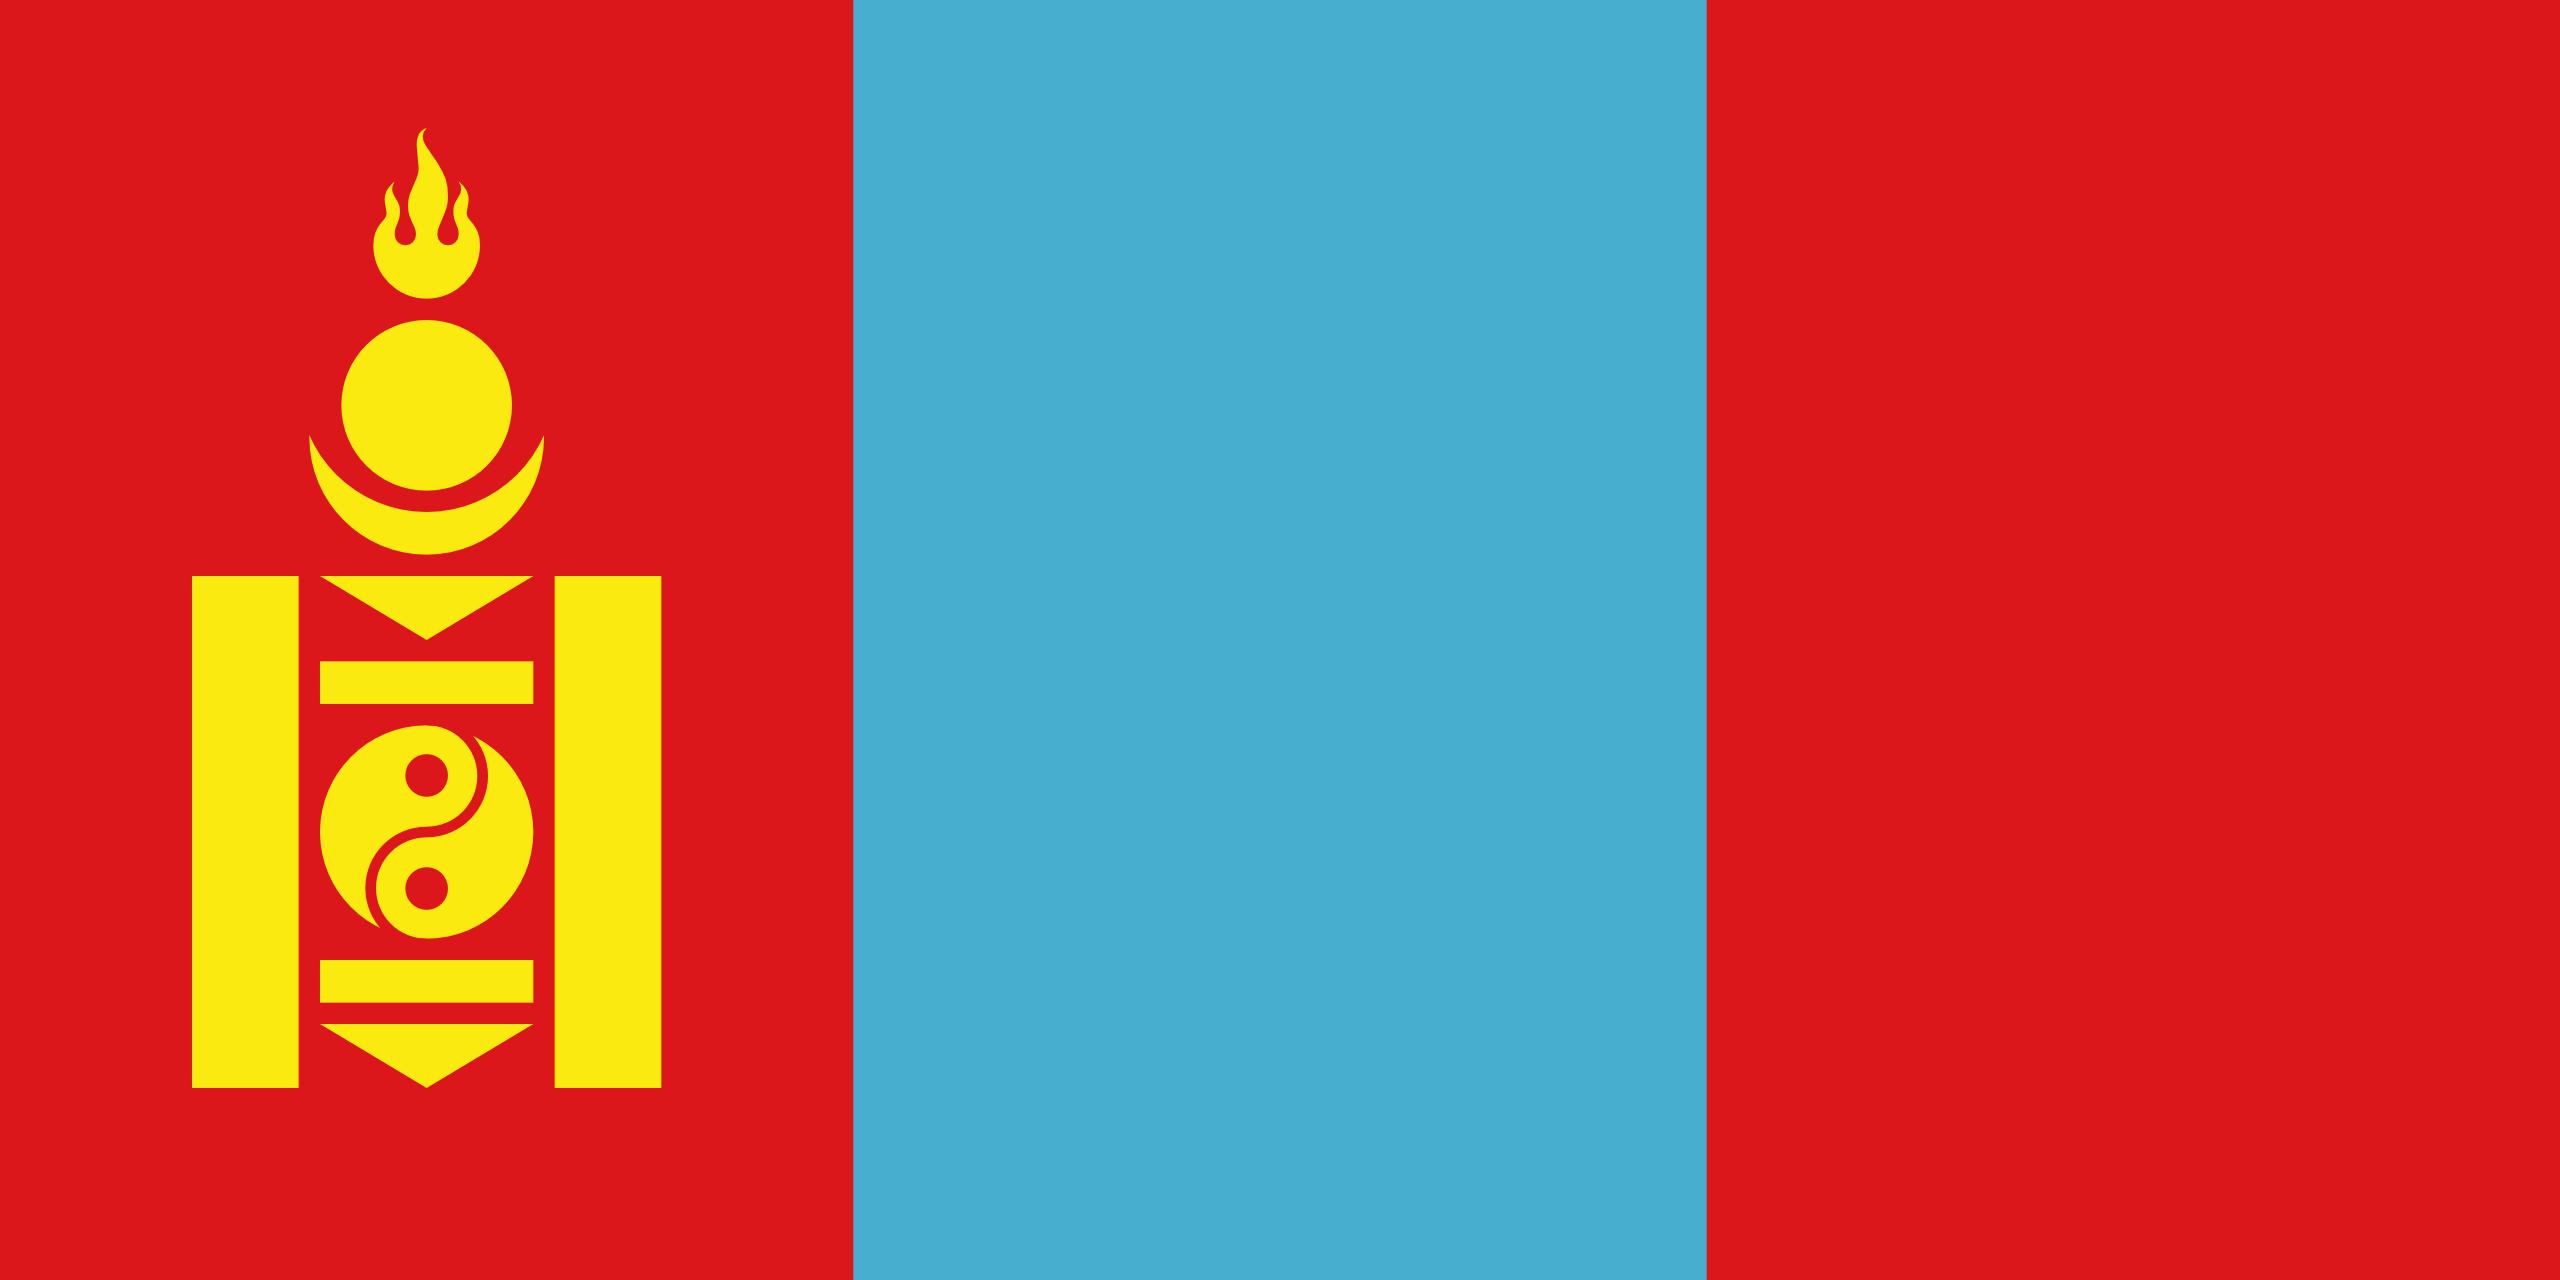 mongolia, pays, emblème, logo, symbole - Fonds d'écran HD - Professor-falken.com